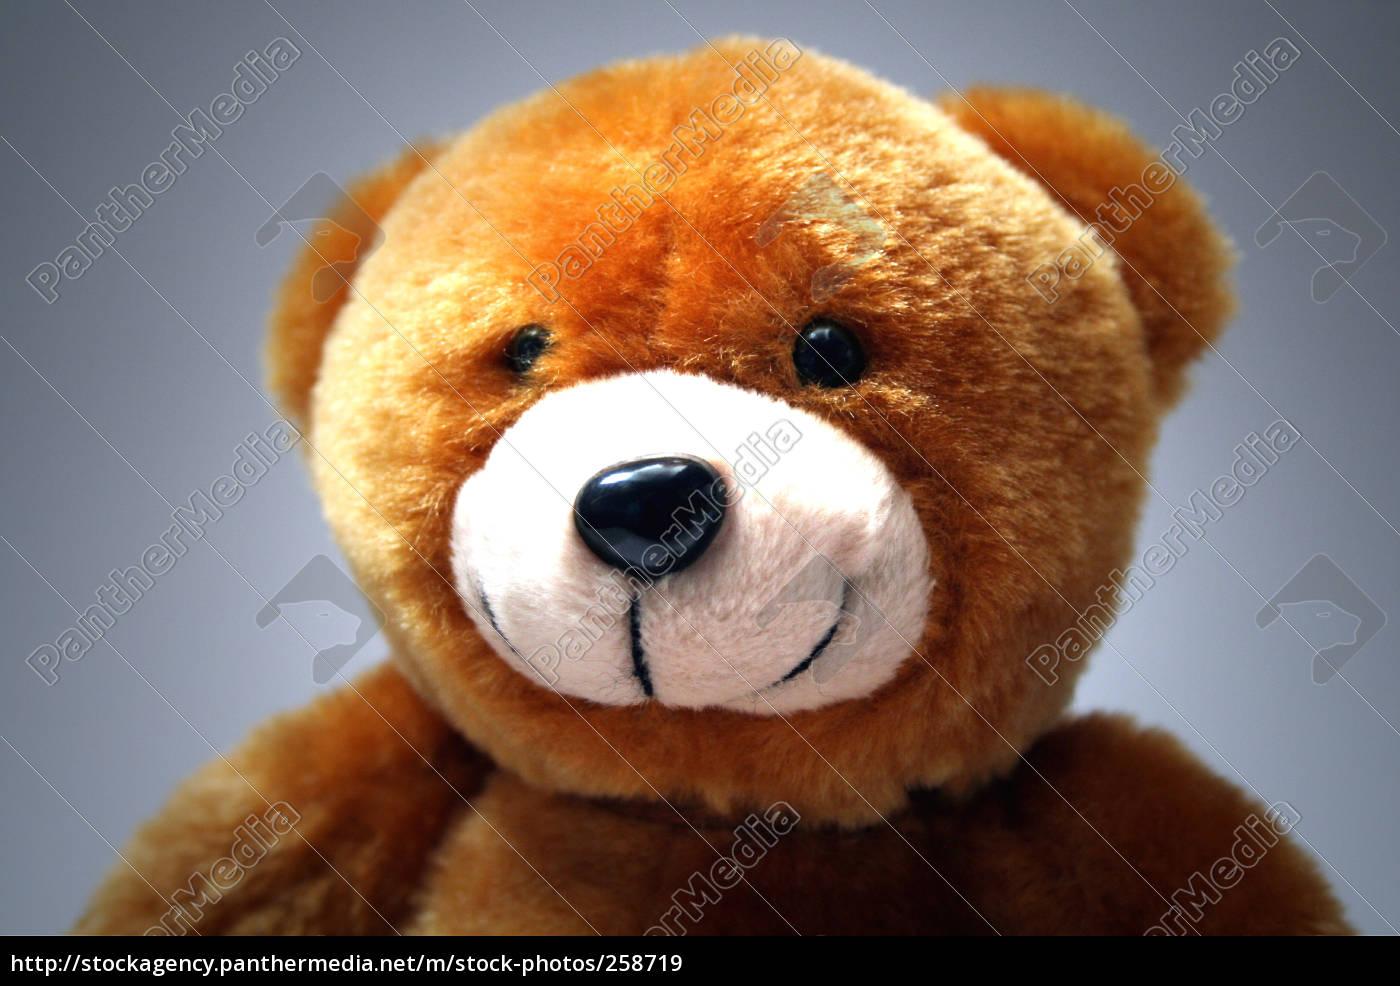 teddy - 258719